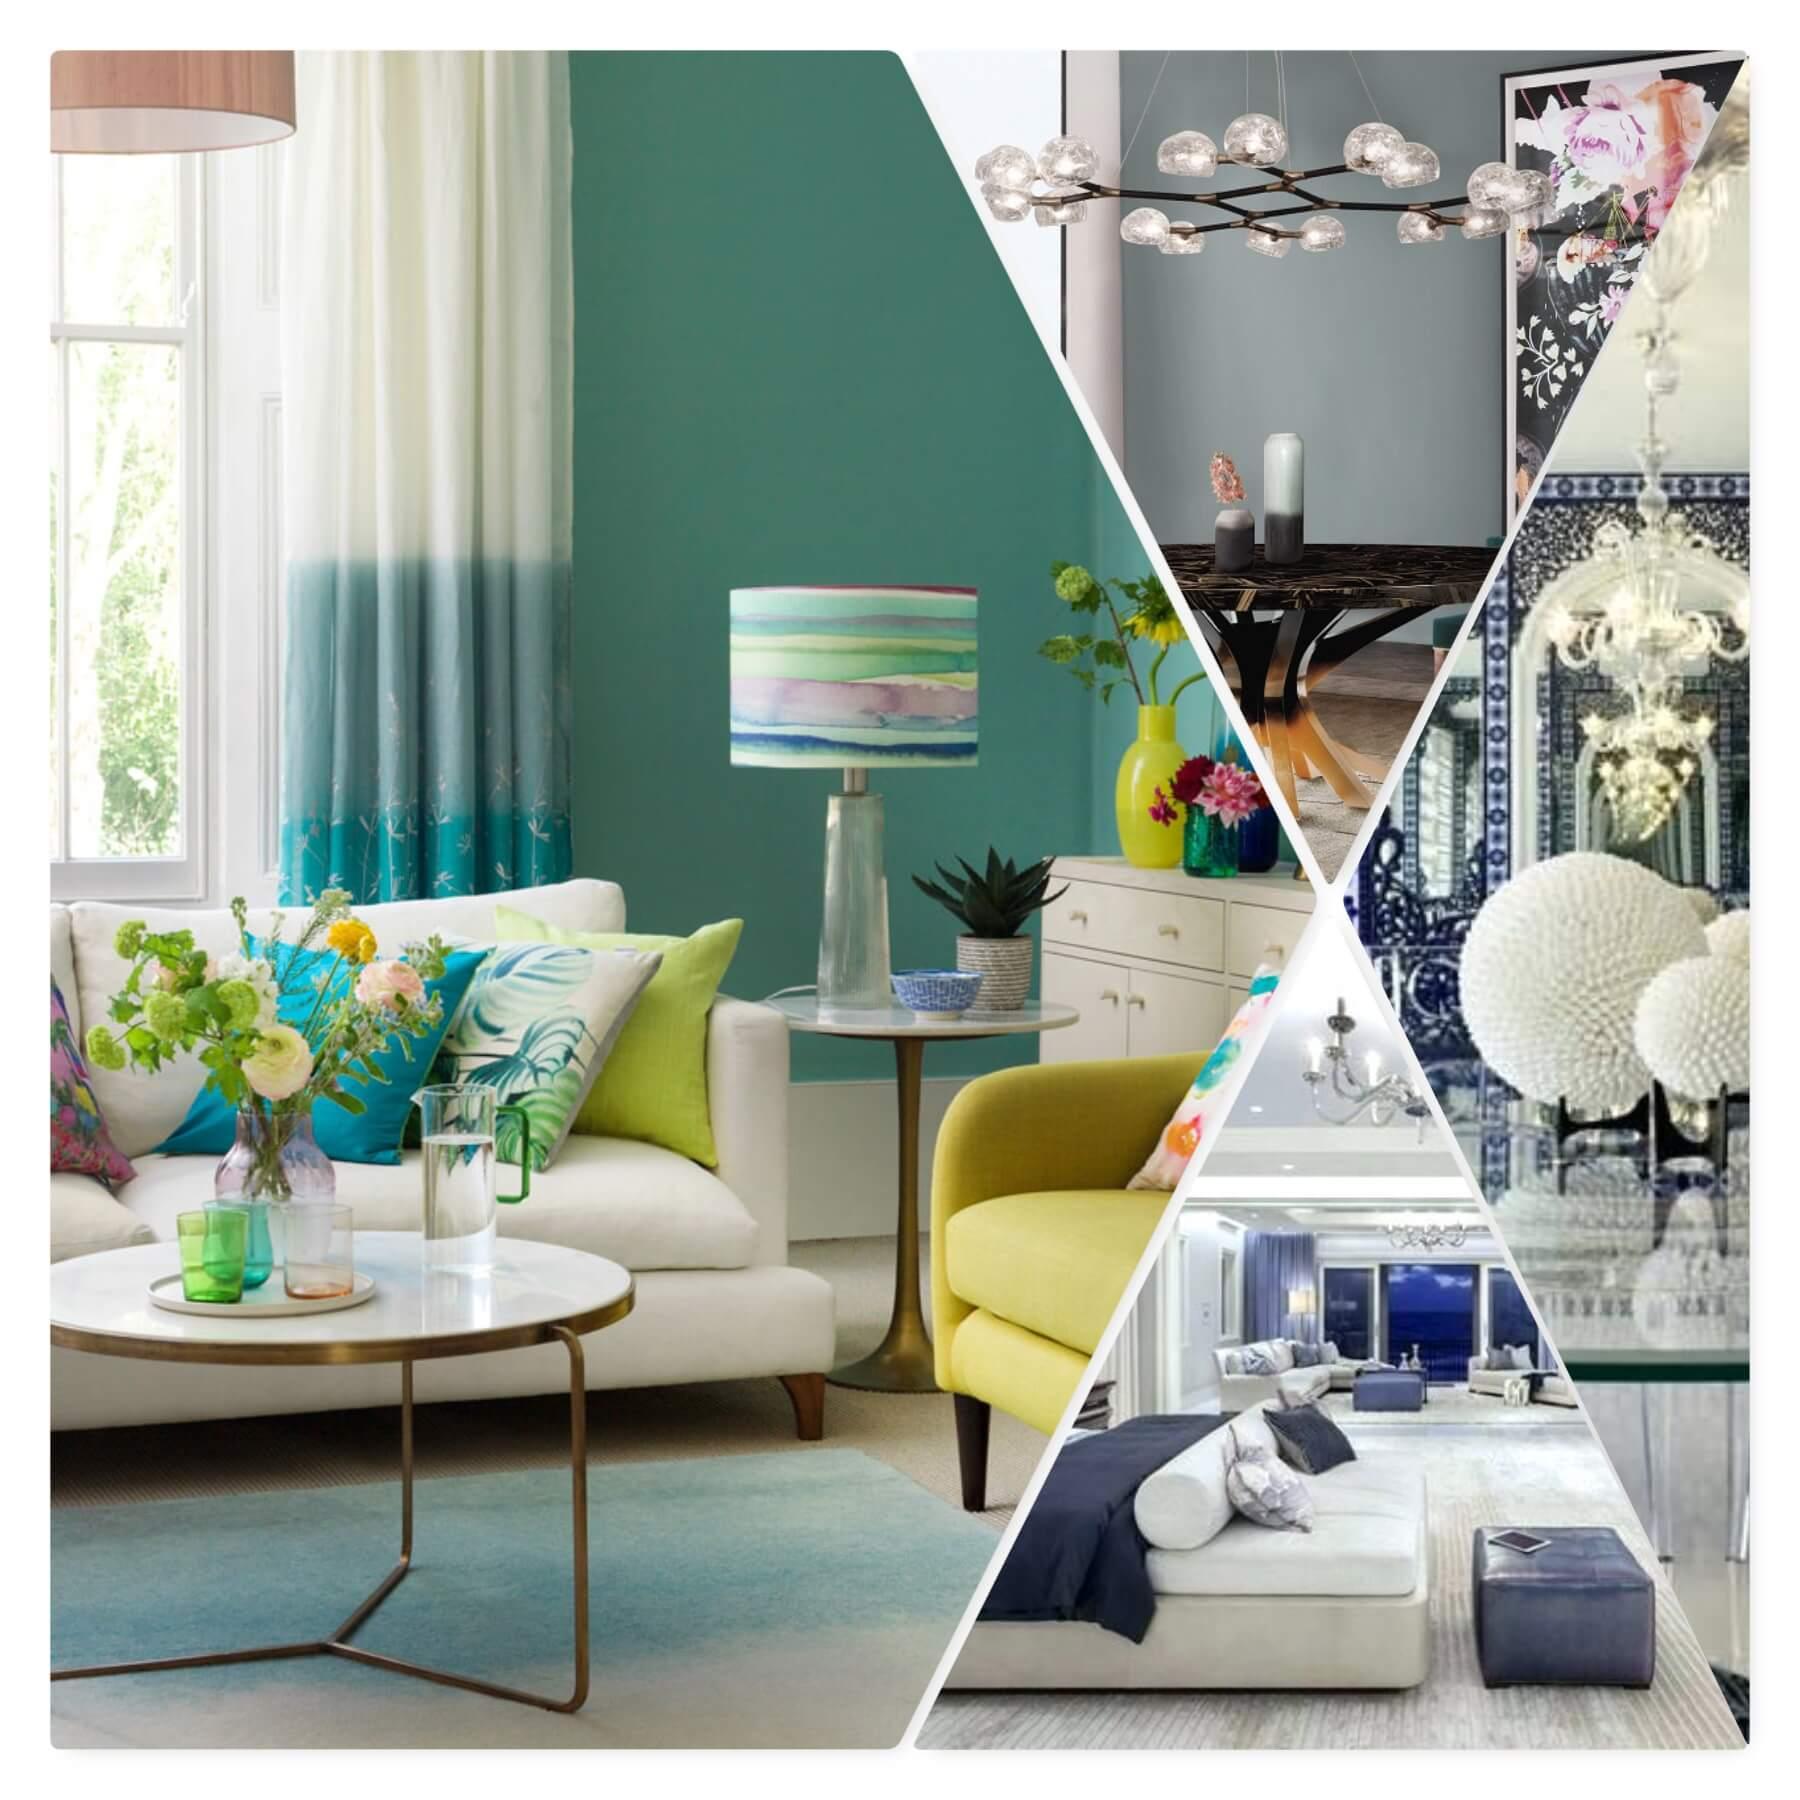 Best Interior Designer Resume For Fresher Sample Wantcv Com